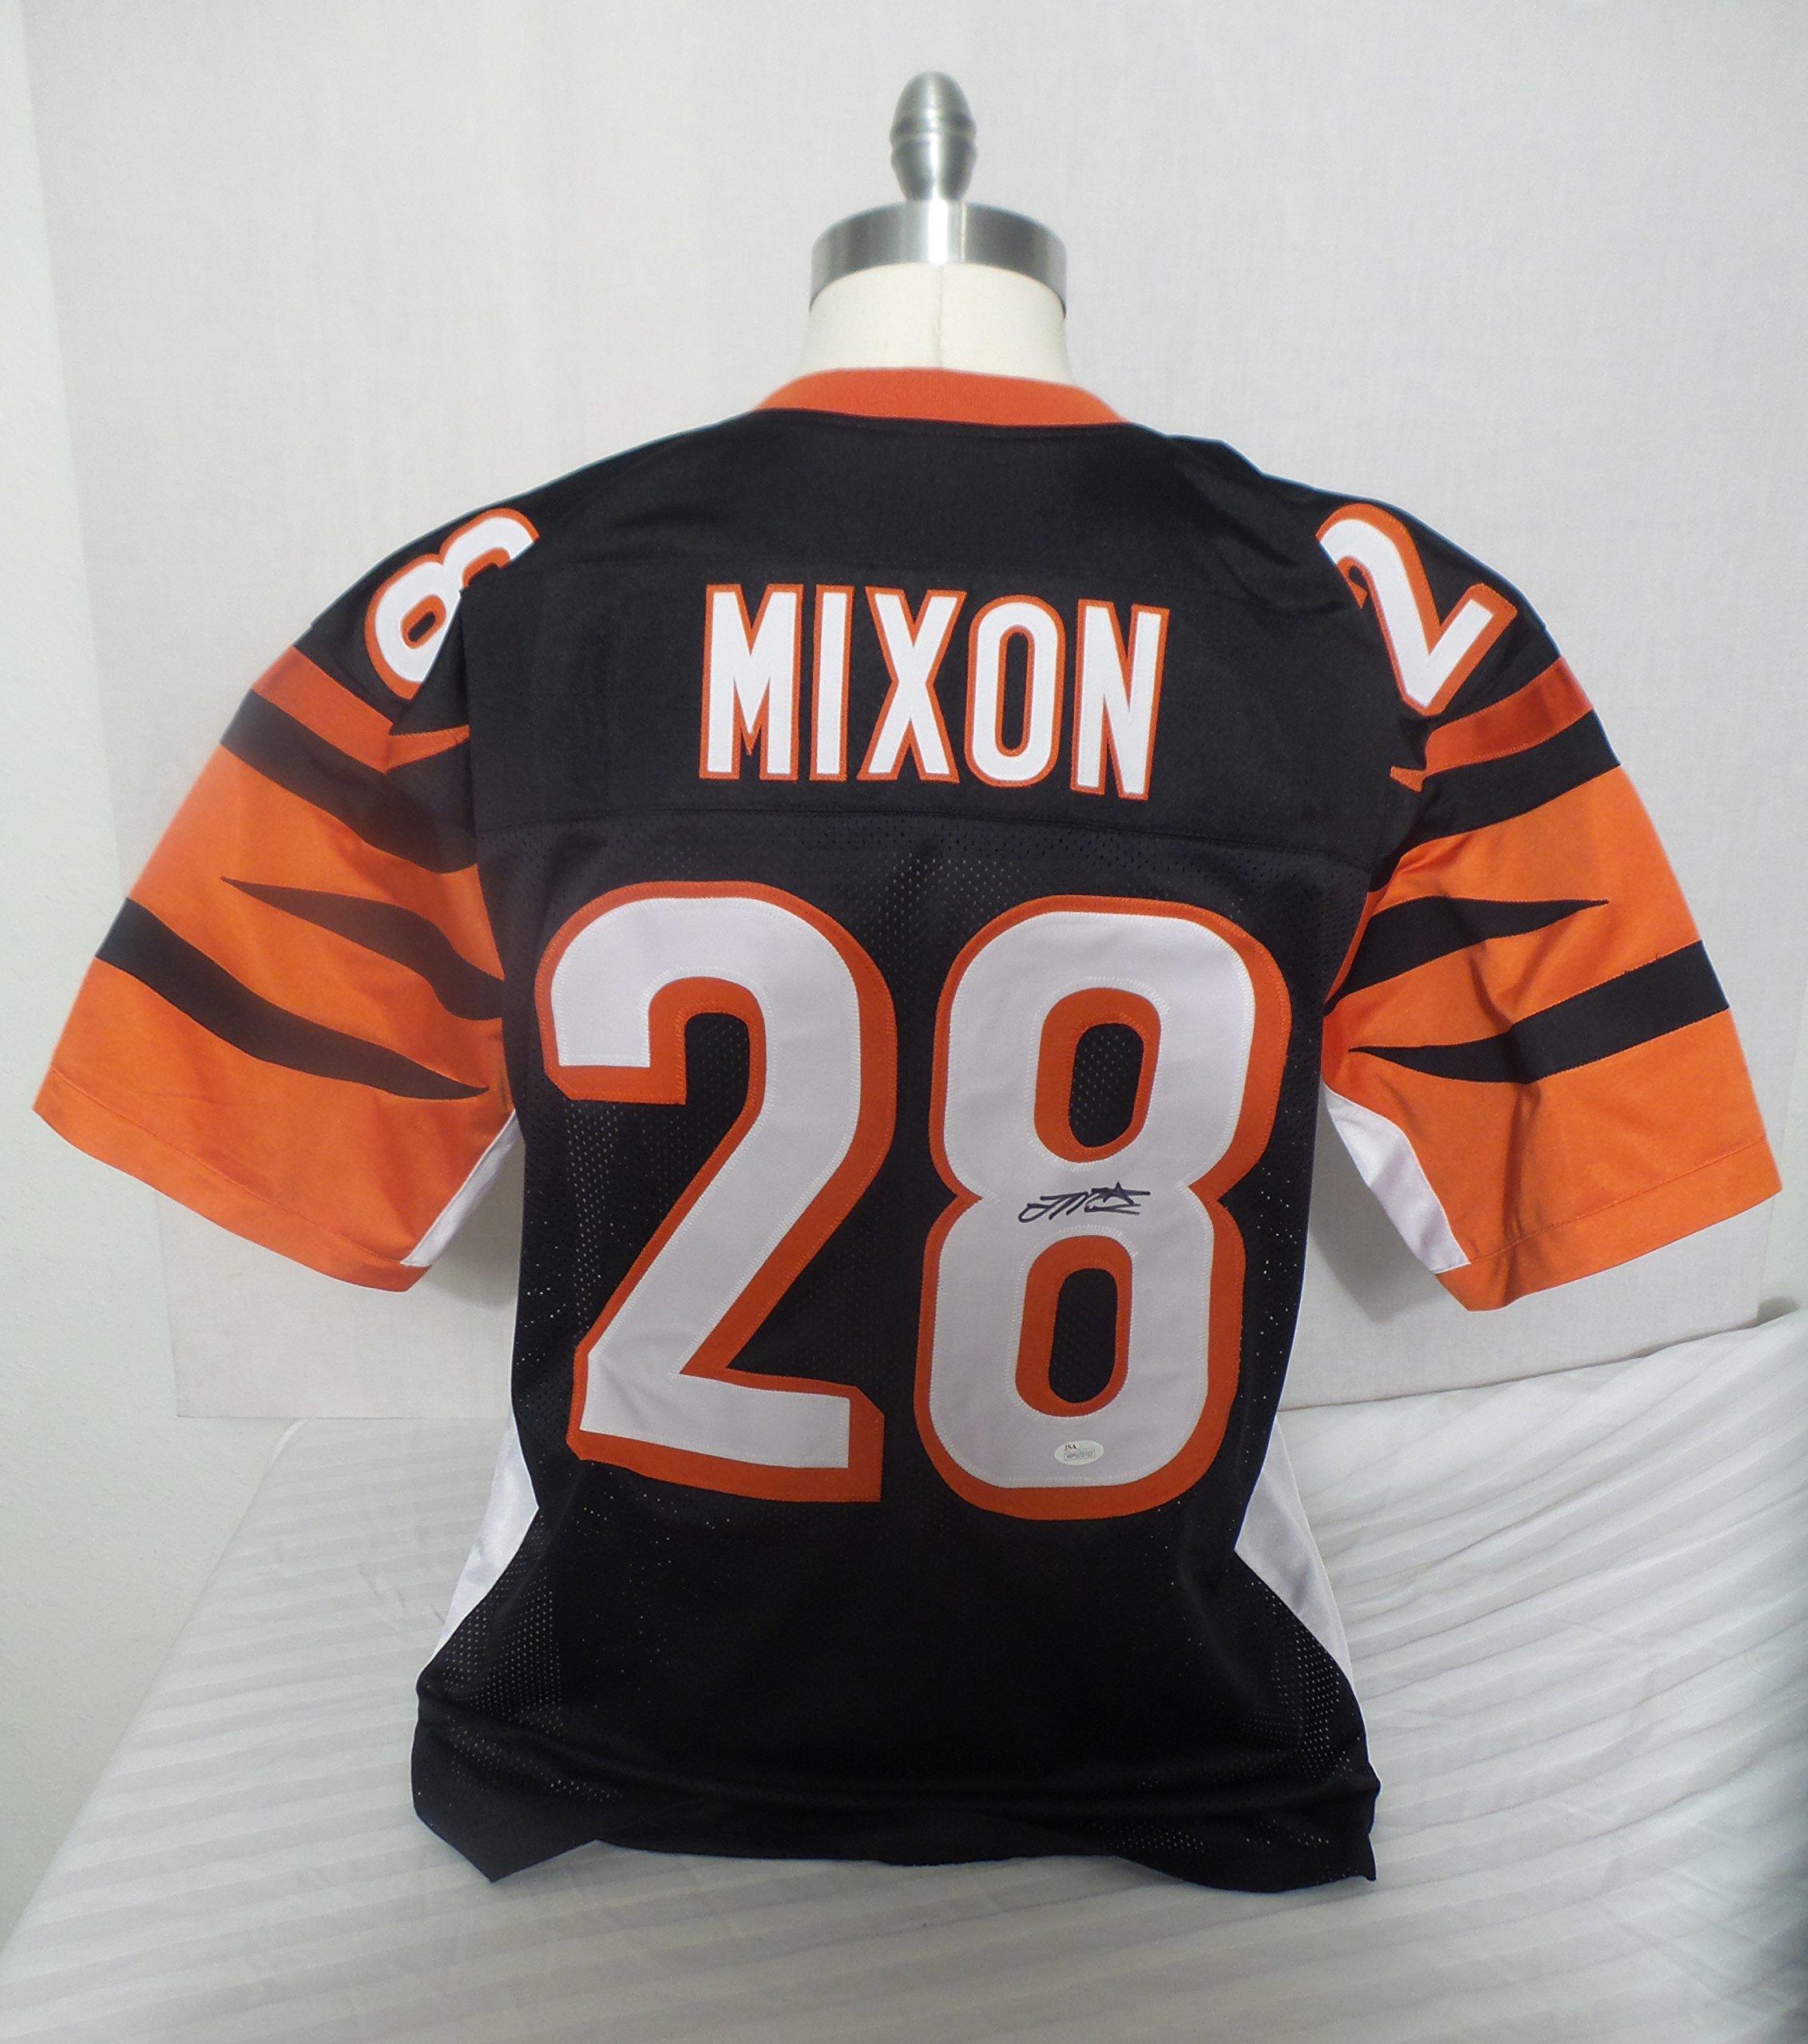 Joe Mixon Signed Cincinnati Bengals Black Autographed Jersey JSA